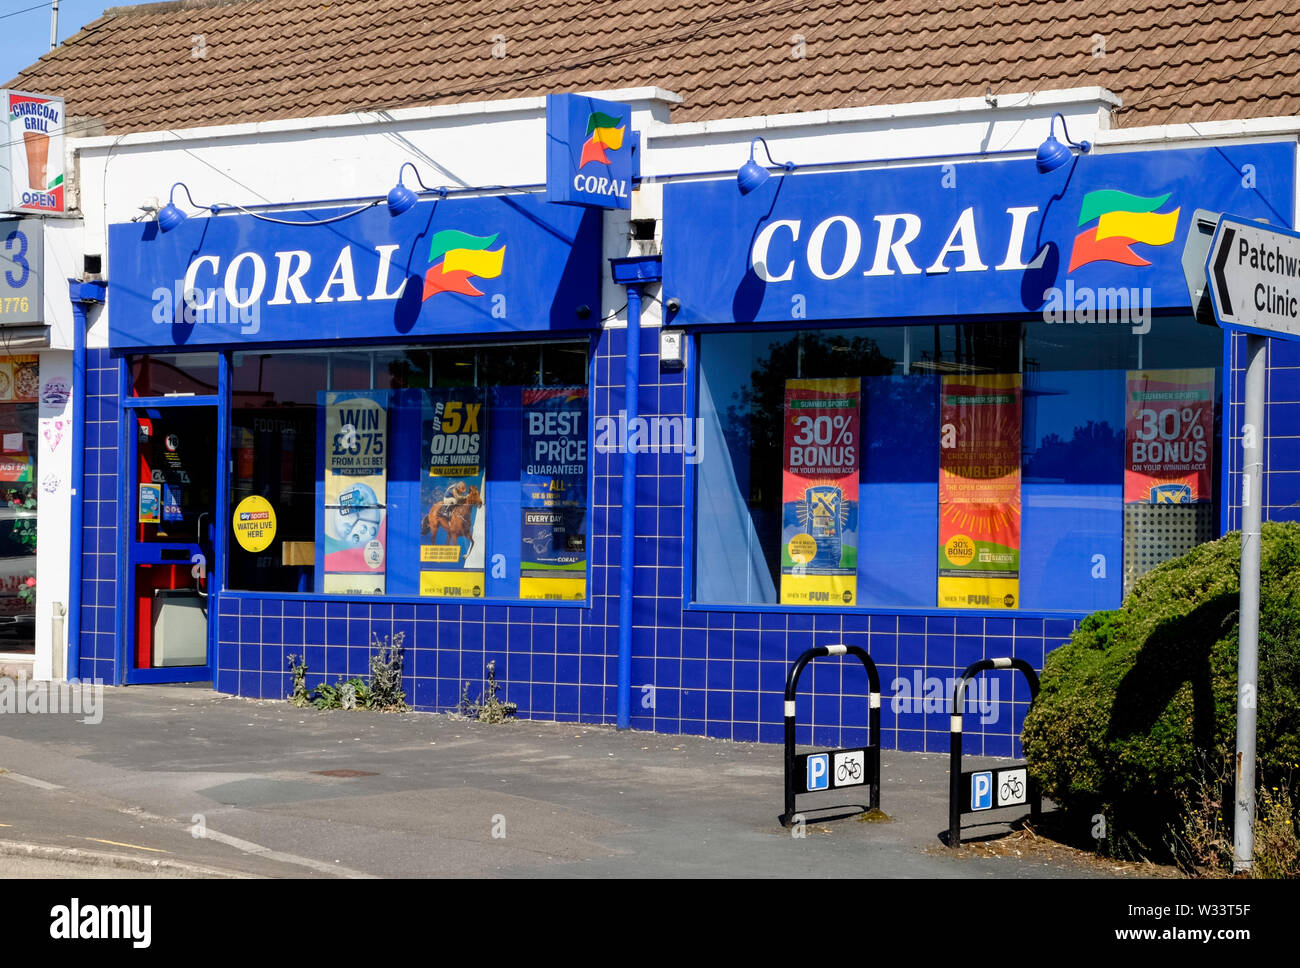 coral betting shop redditch cinema